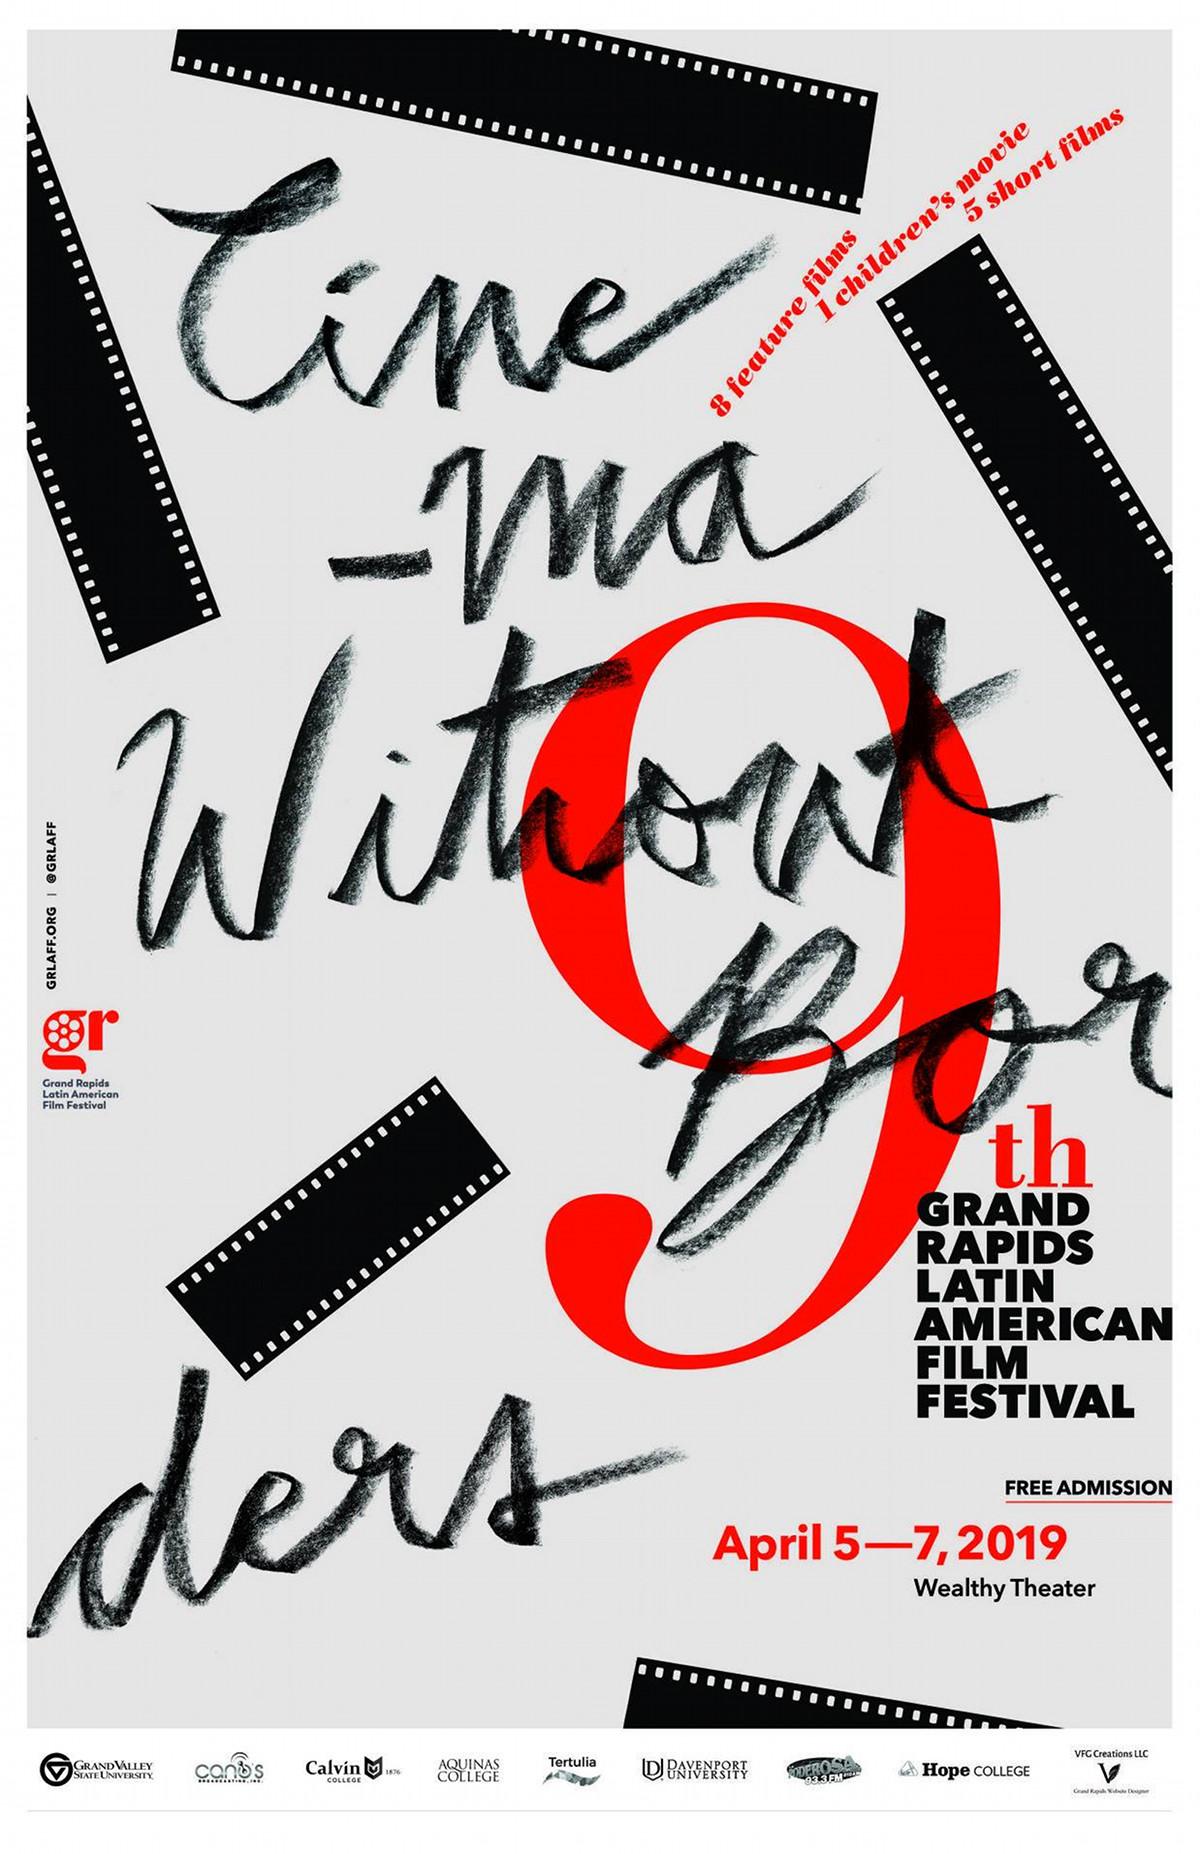 Grand Rapids Latin American Film Festival 2019 poster